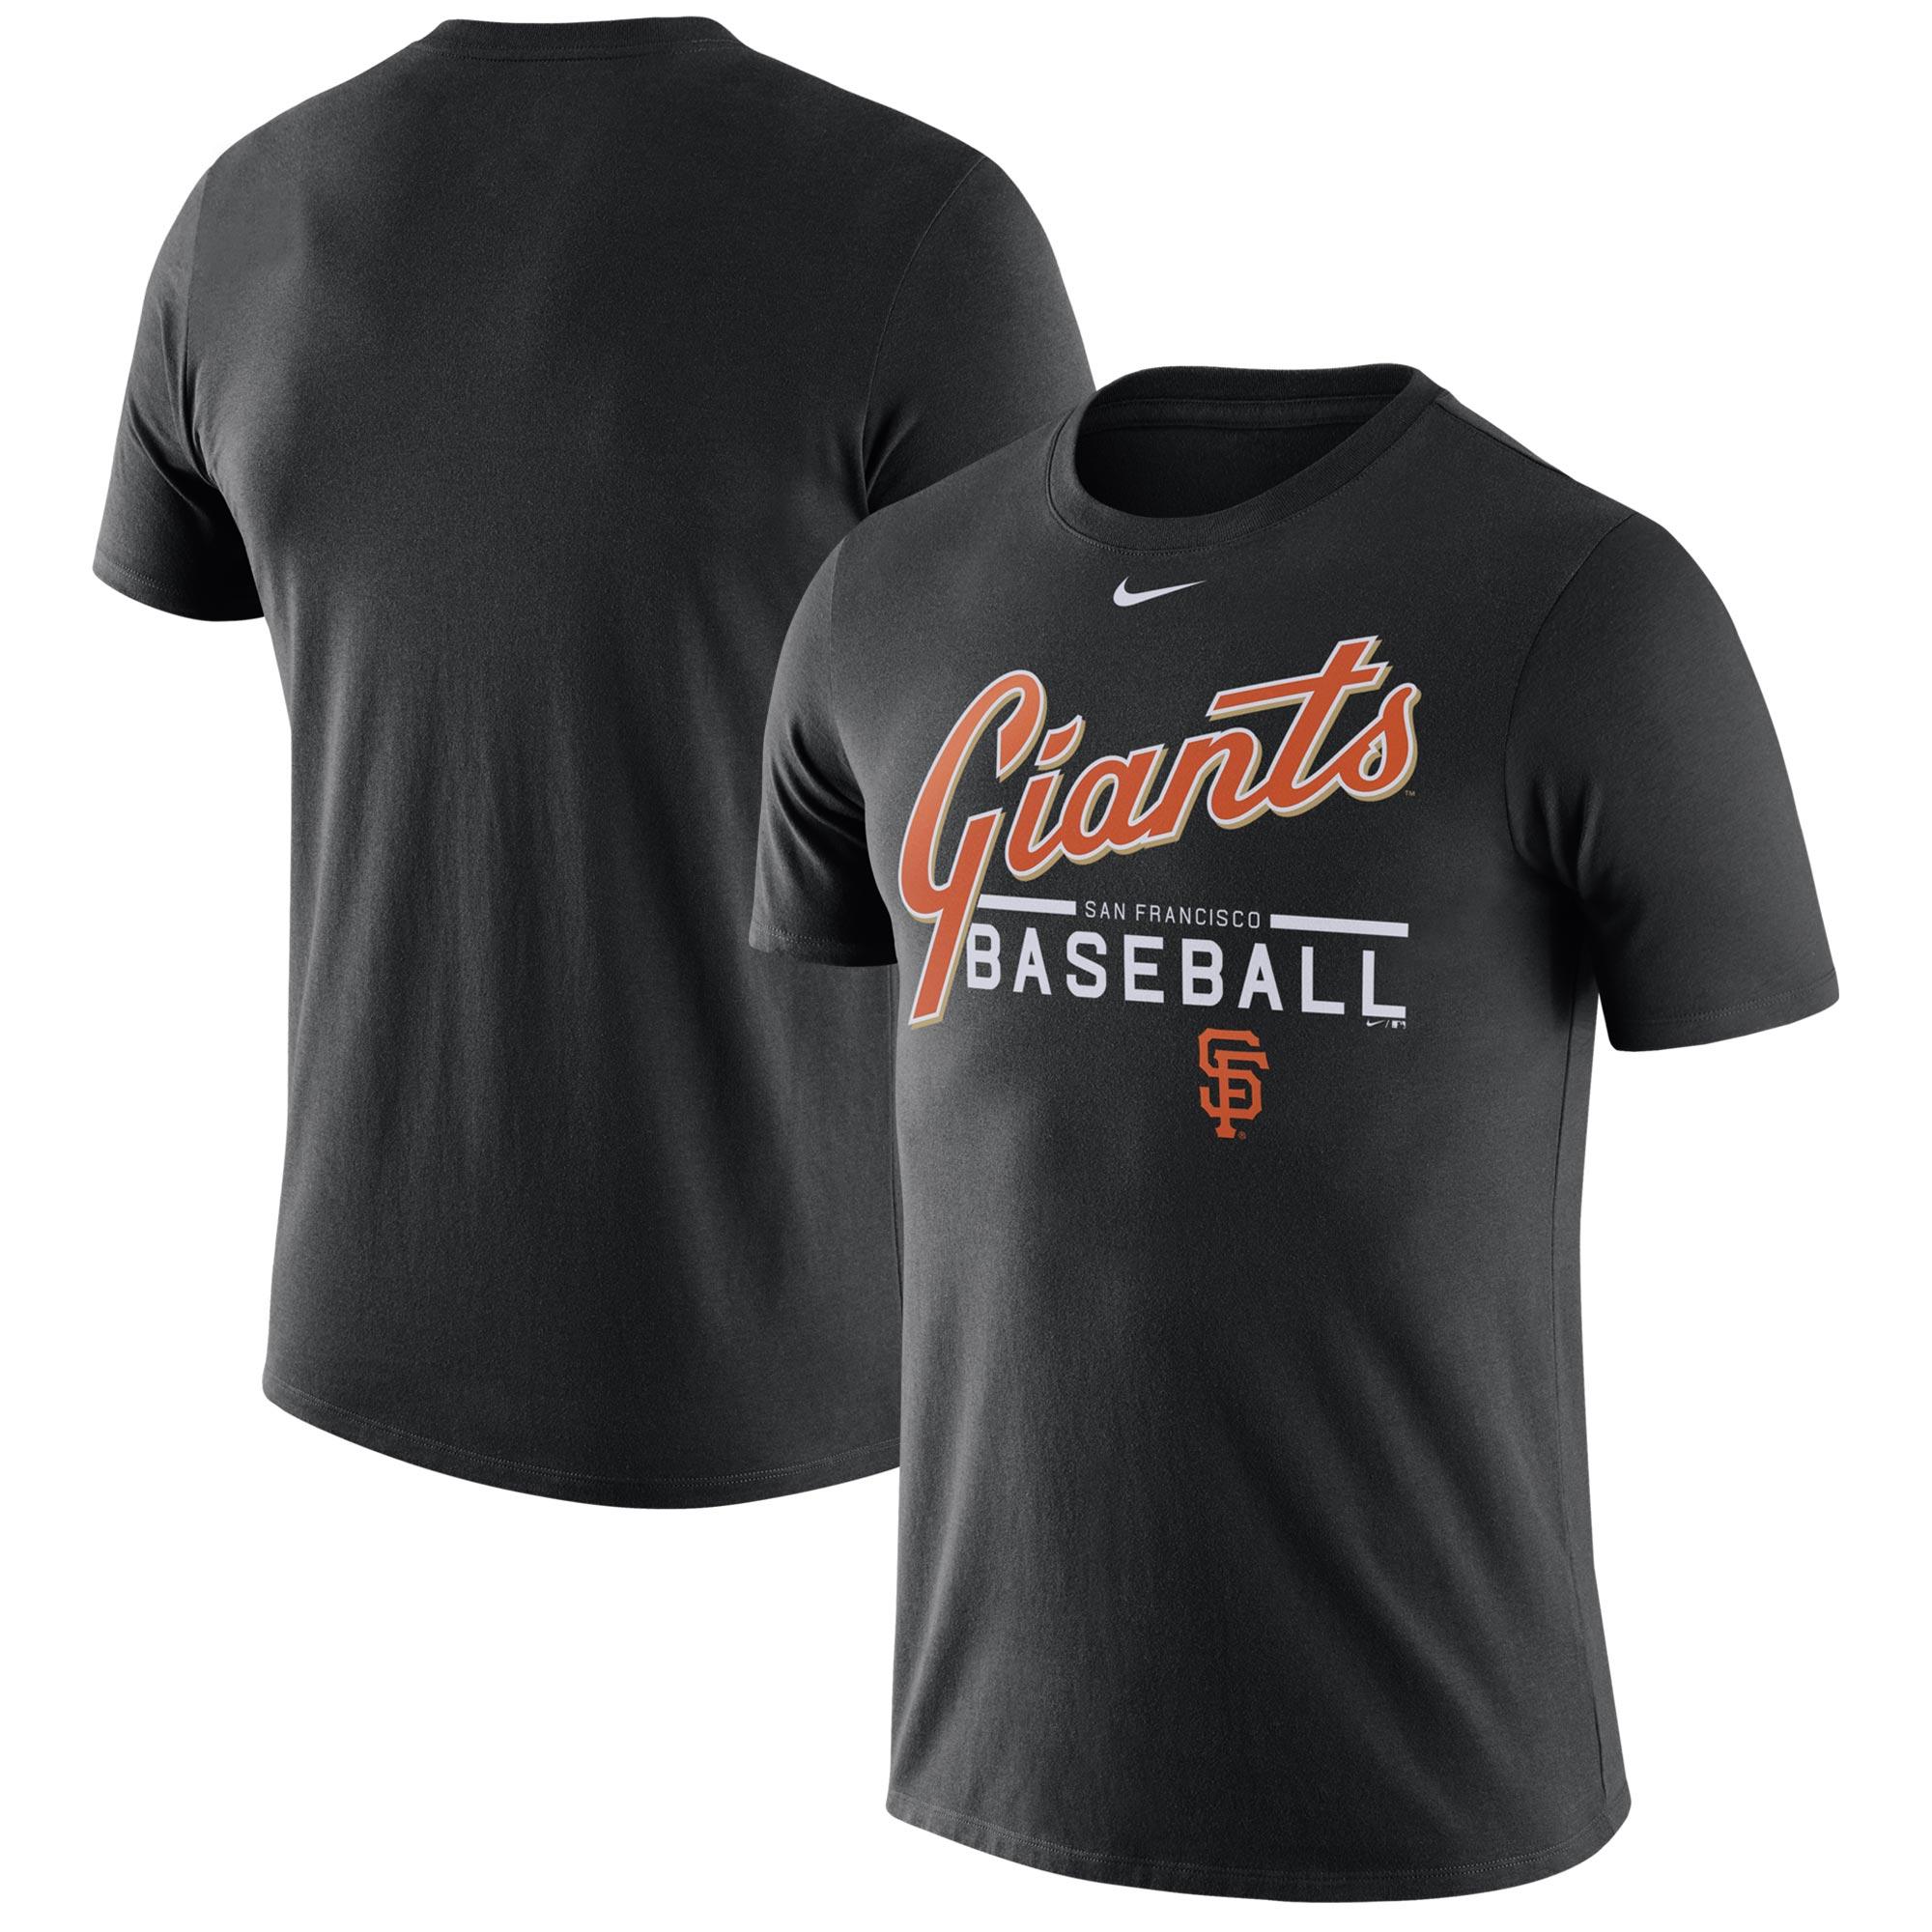 Men's Nike Black San Francisco Giants Practice T-Shirt -